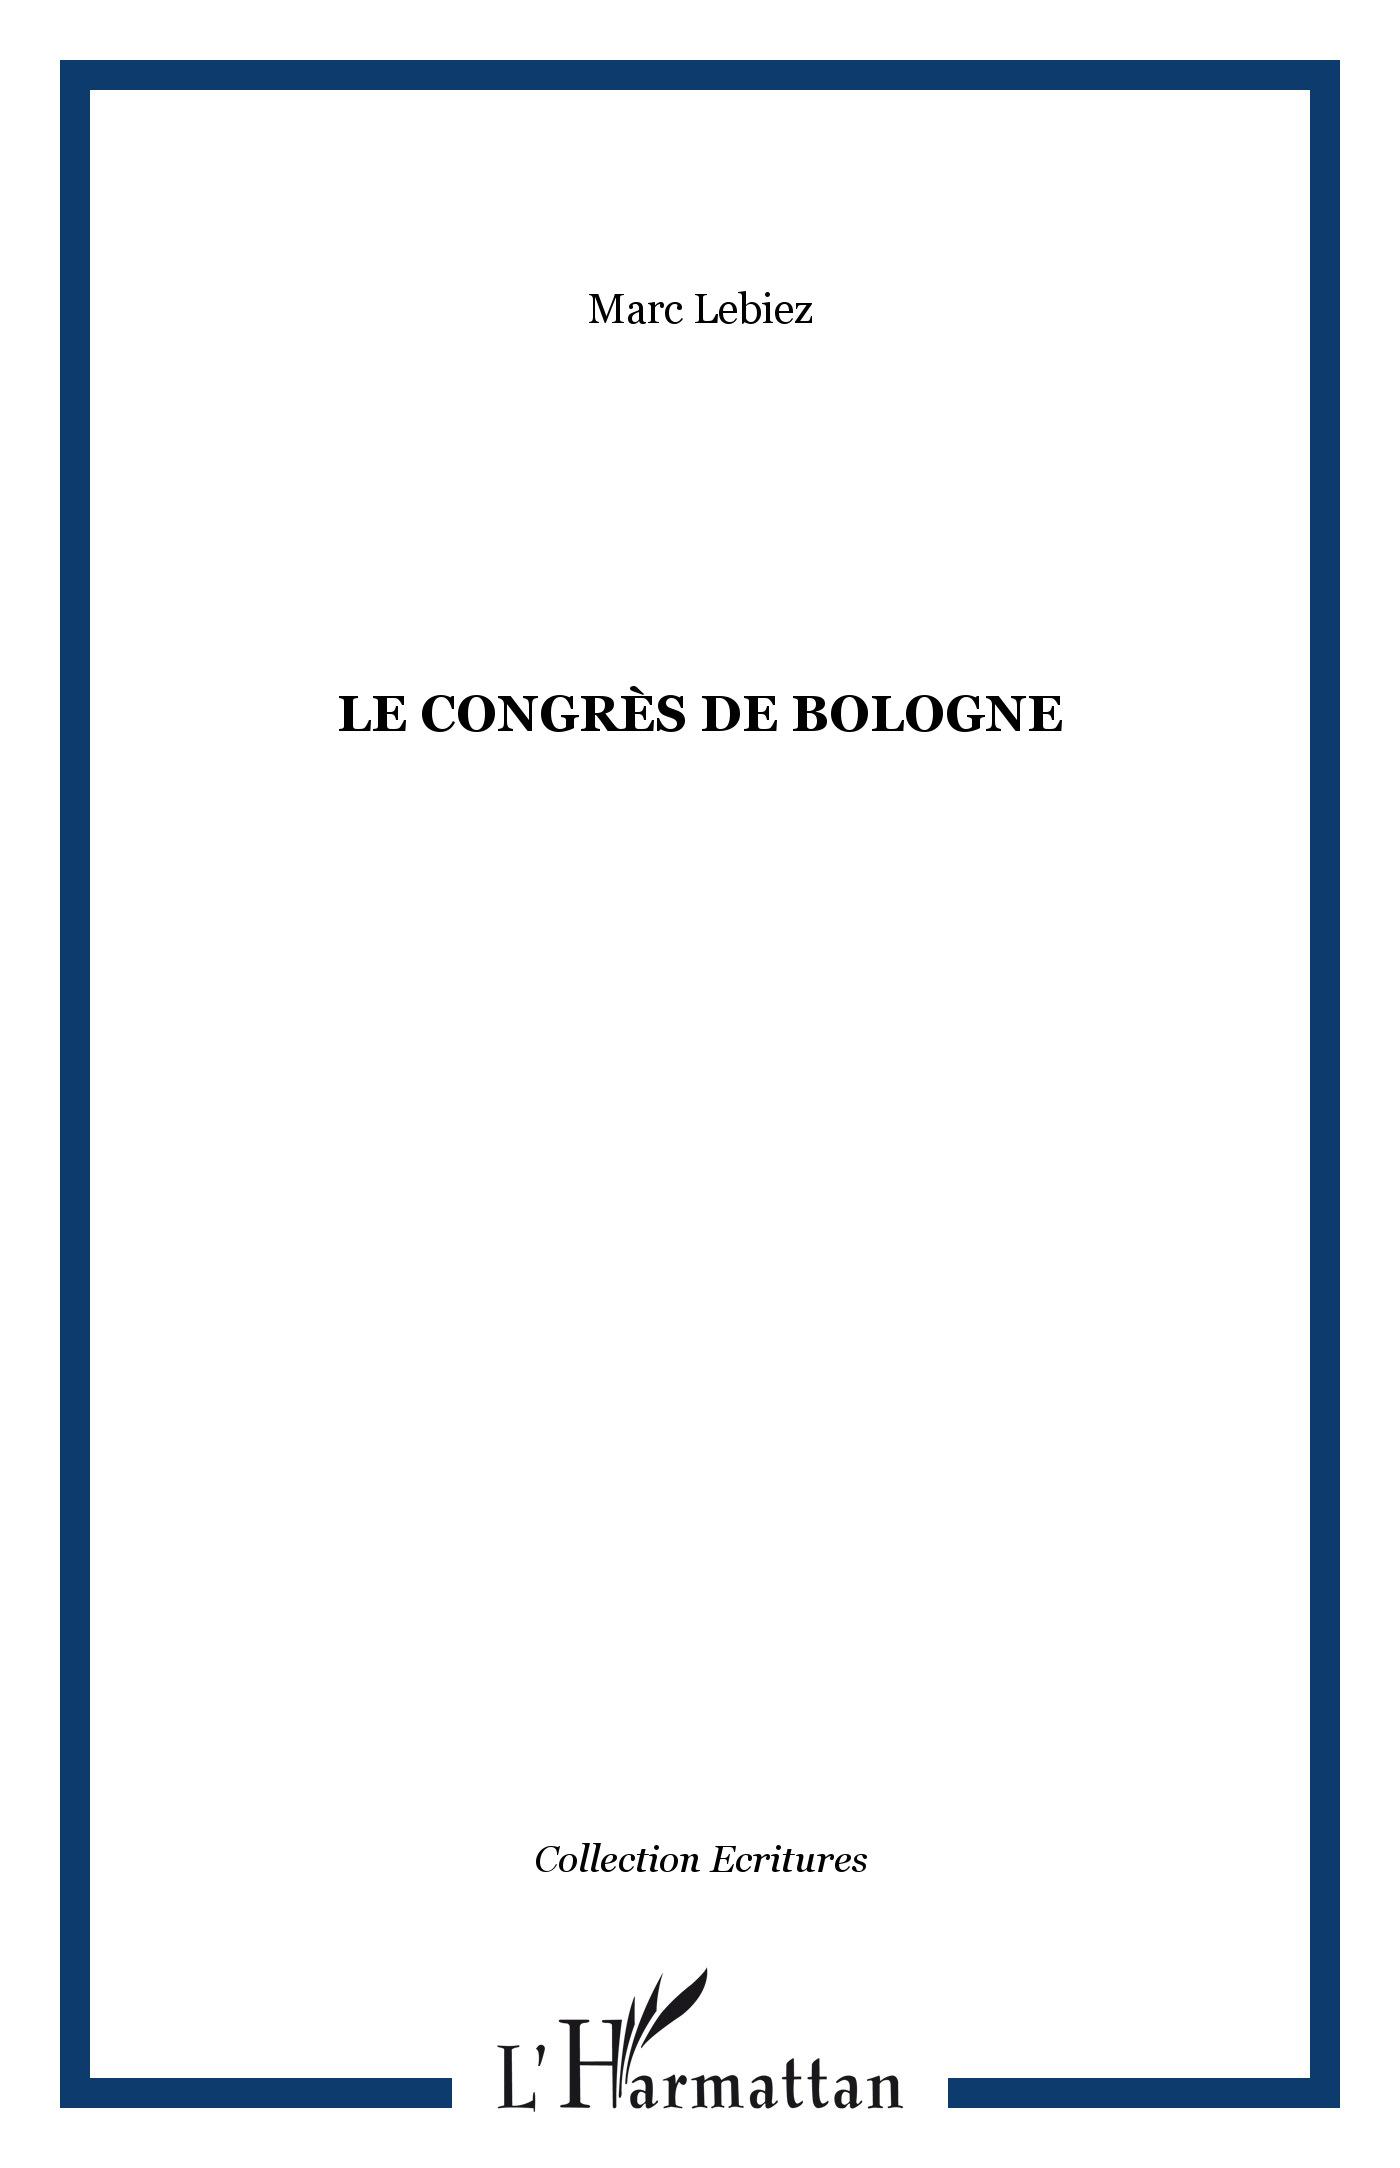 LE CONGRÈS DE